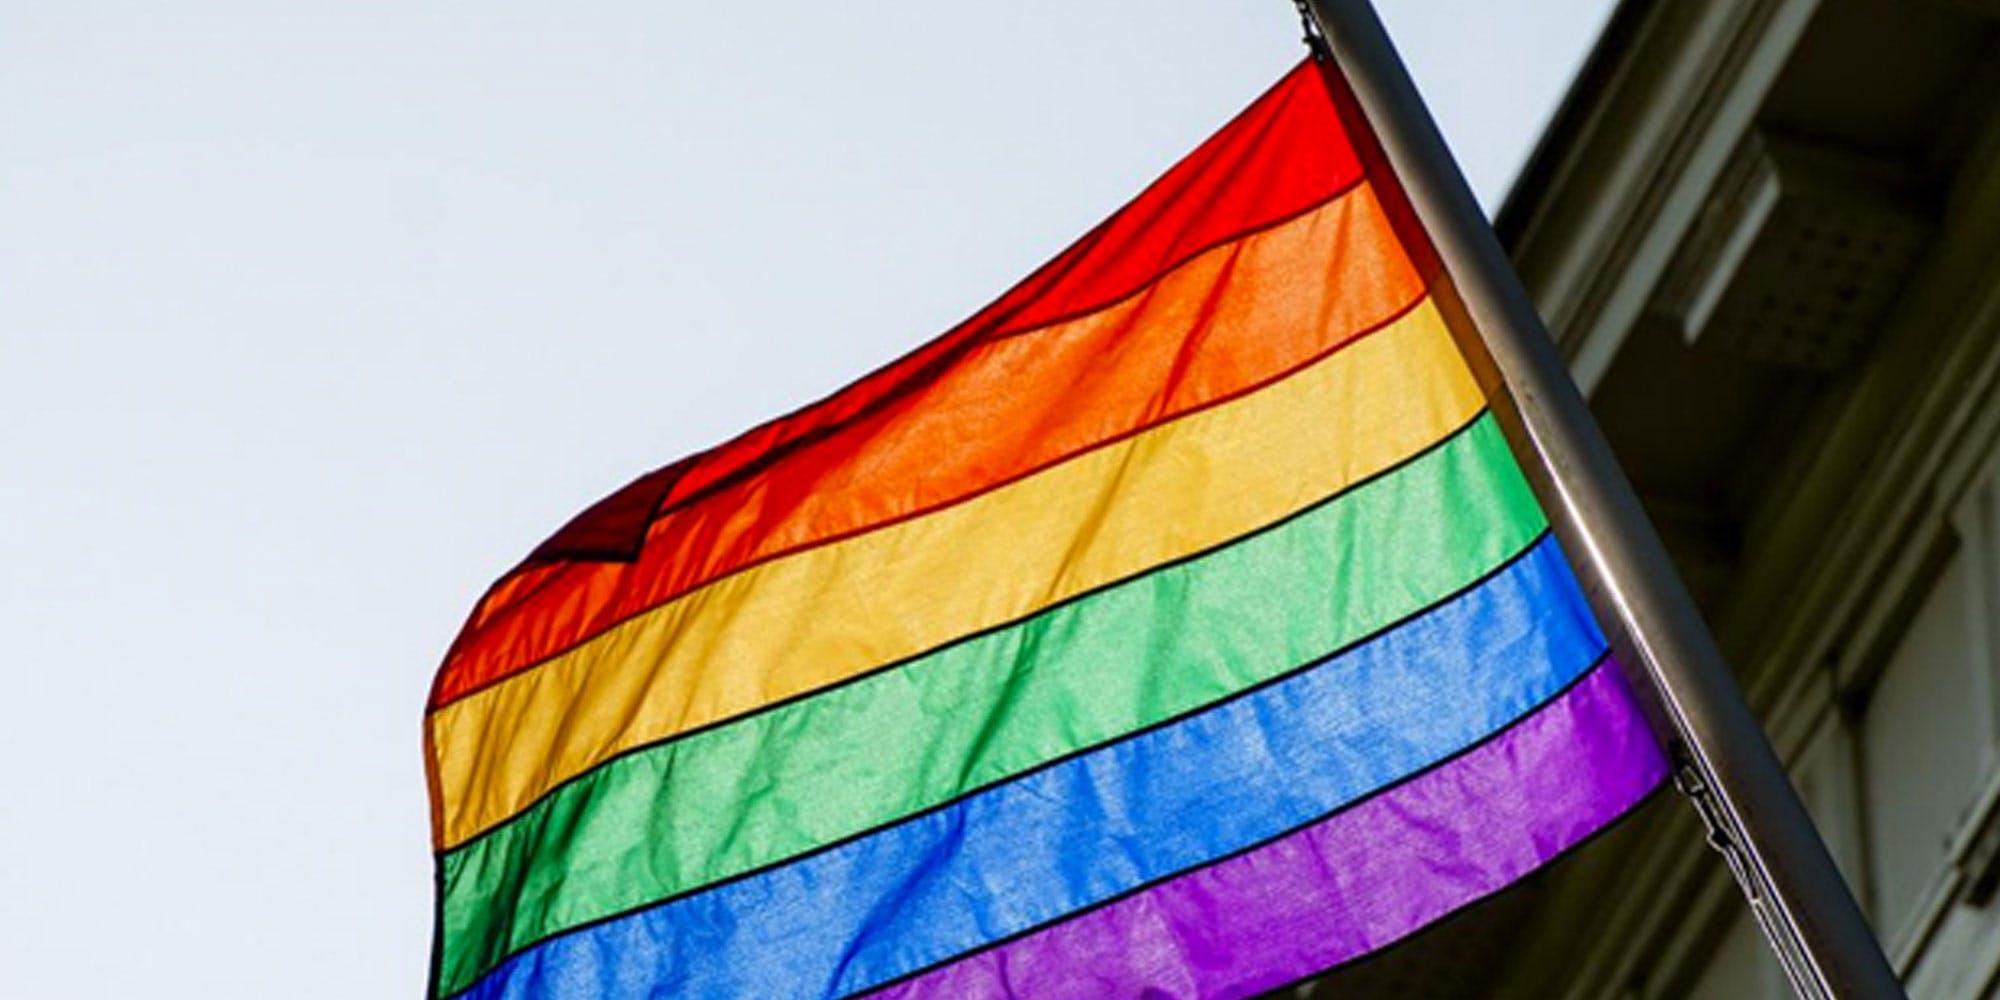 Gay friendly rotterdam rotterdam tourist information vvv for Lantaren venster rotterdam agenda